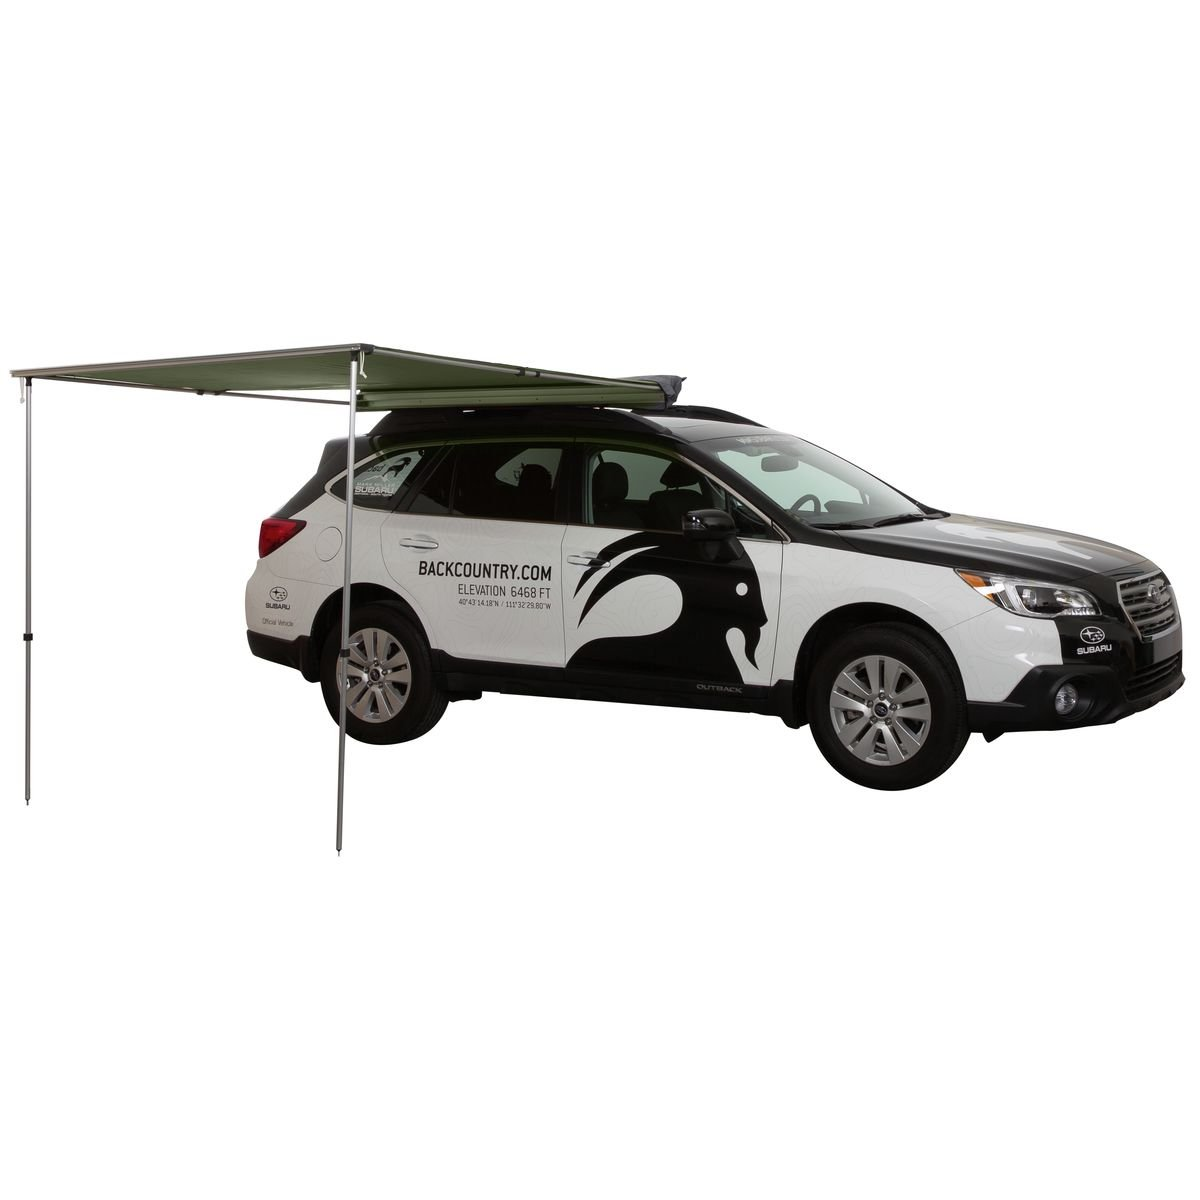 Tepuiオーニング窓 B06XXR9QVL 6ft|Green Canopy/Black Cover Green Canopy/Black Cover 6ft